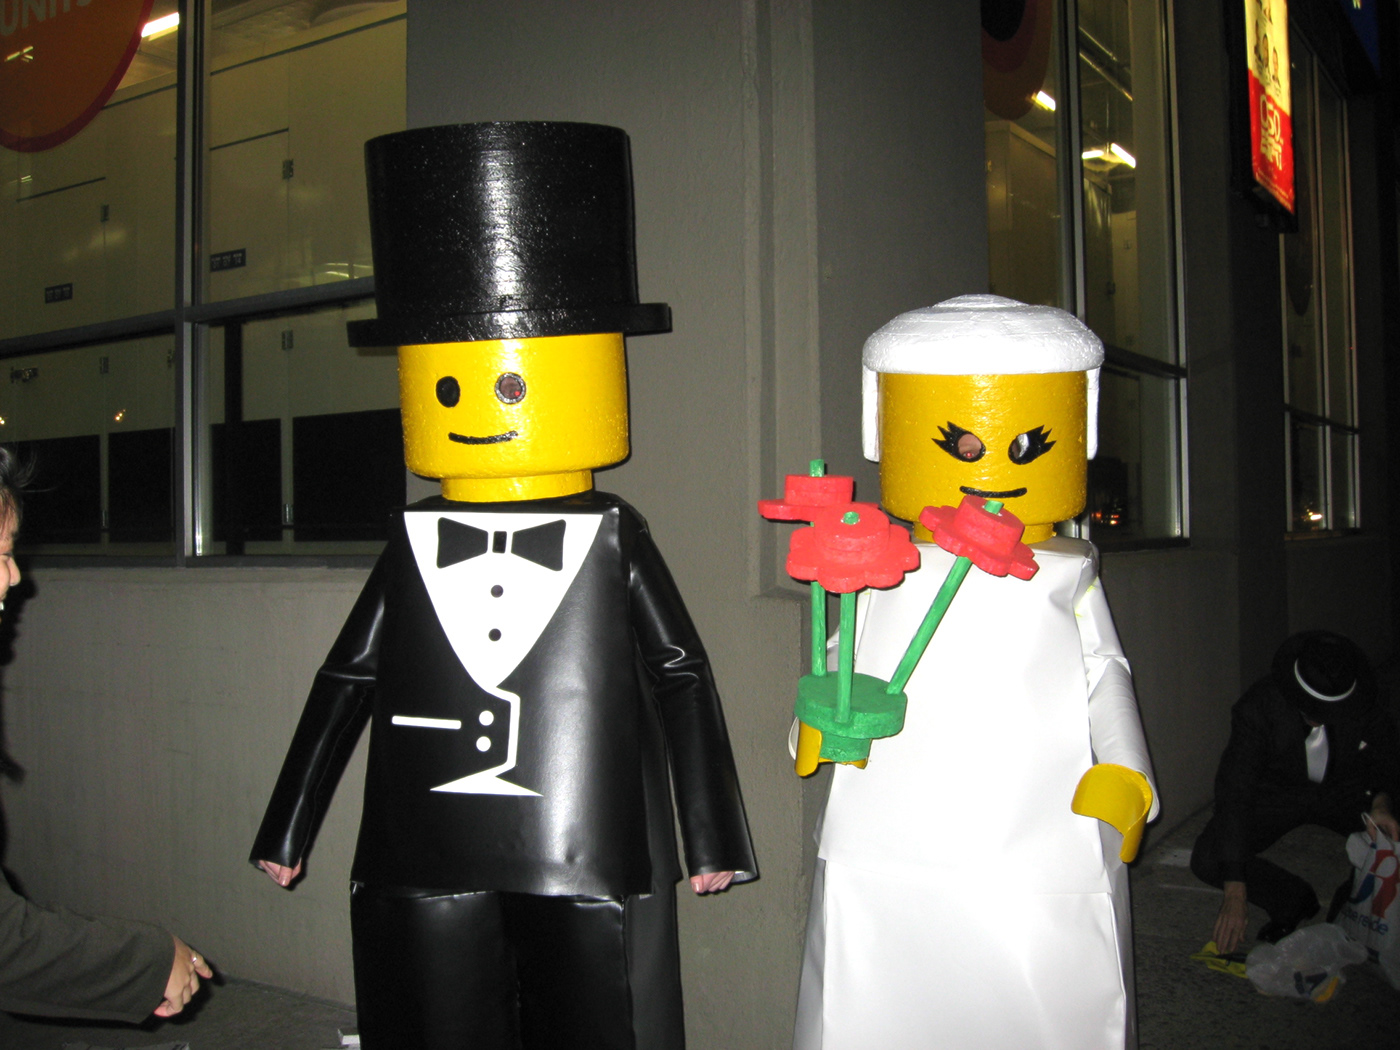 LEGO costume lego costume bride and groom Lego minifigure minifig lego minifig minifig costume